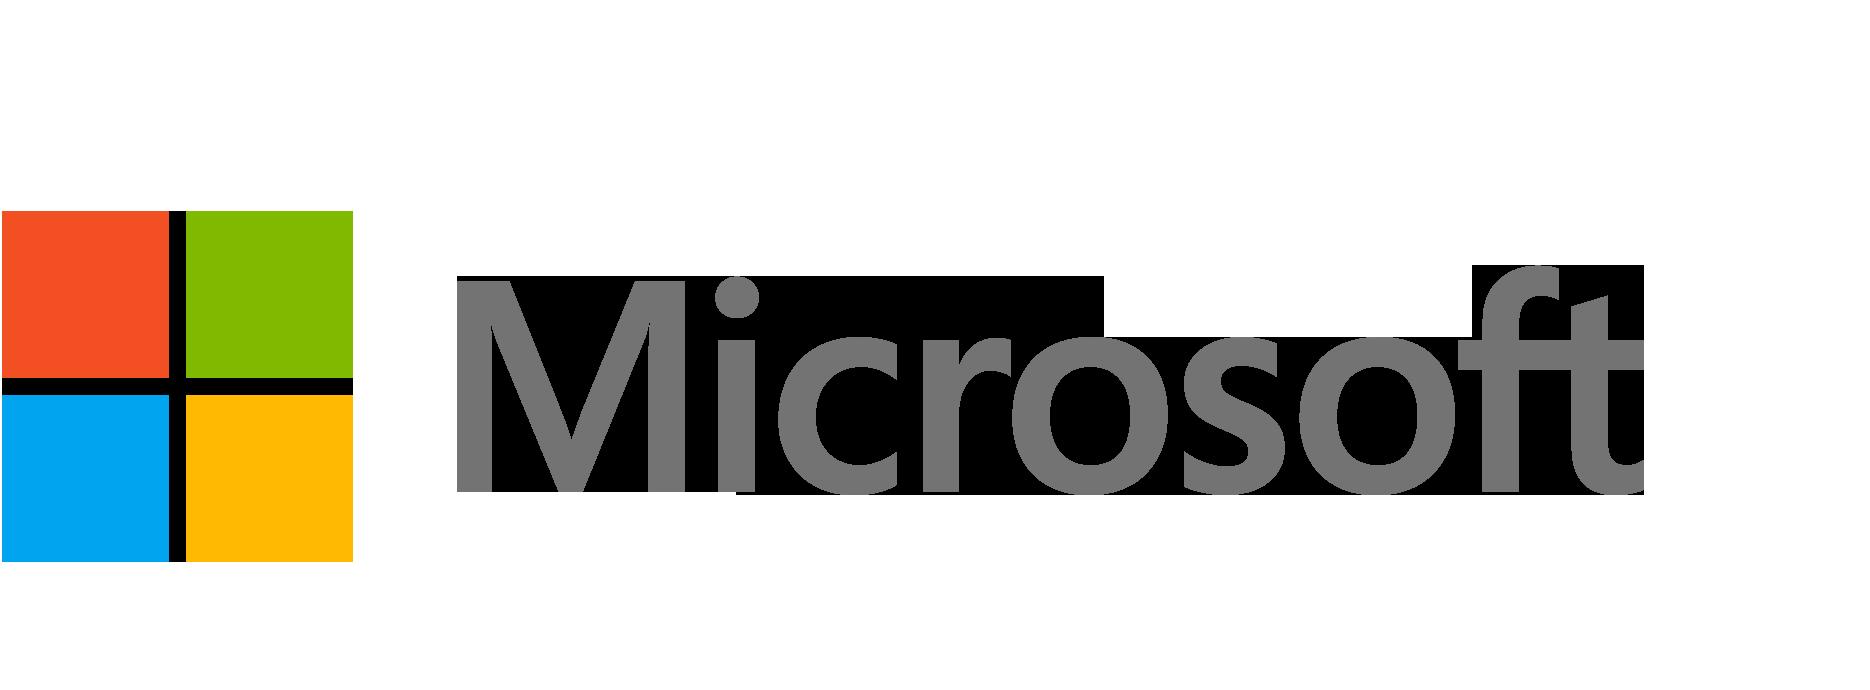 Windows Server CAL - 1 Device CAL - 1 year (DG7GMGF0DVT7)